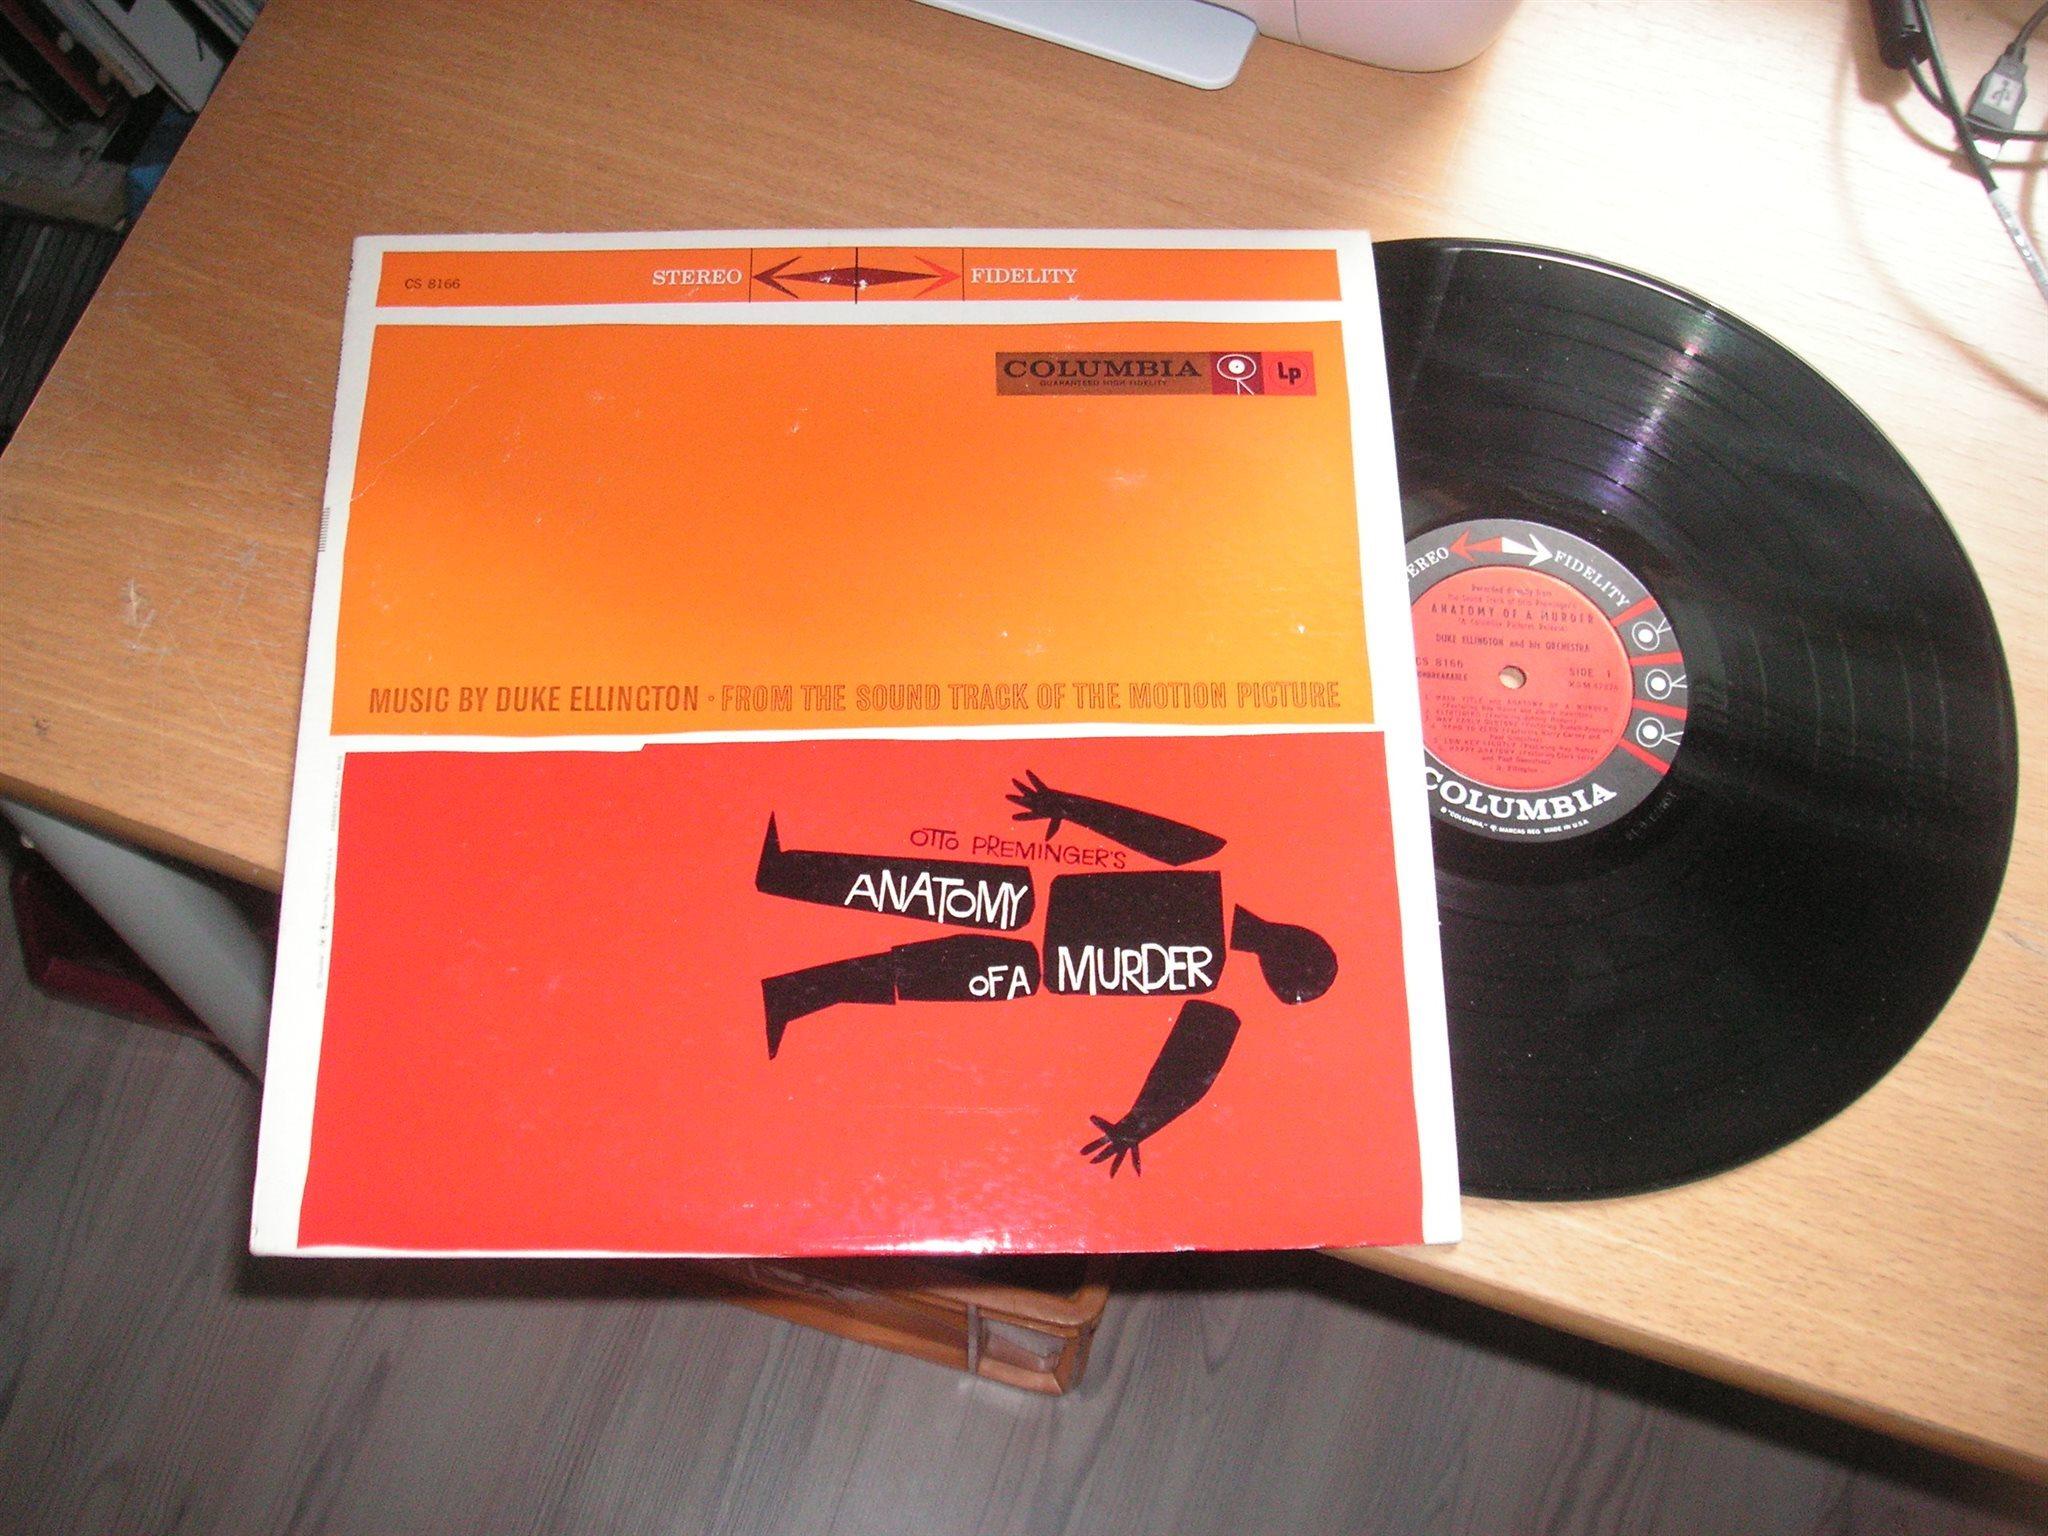 Duke Ellington Anatomy of a murder Coolt crime .. (311596183) ᐈ Köp ...